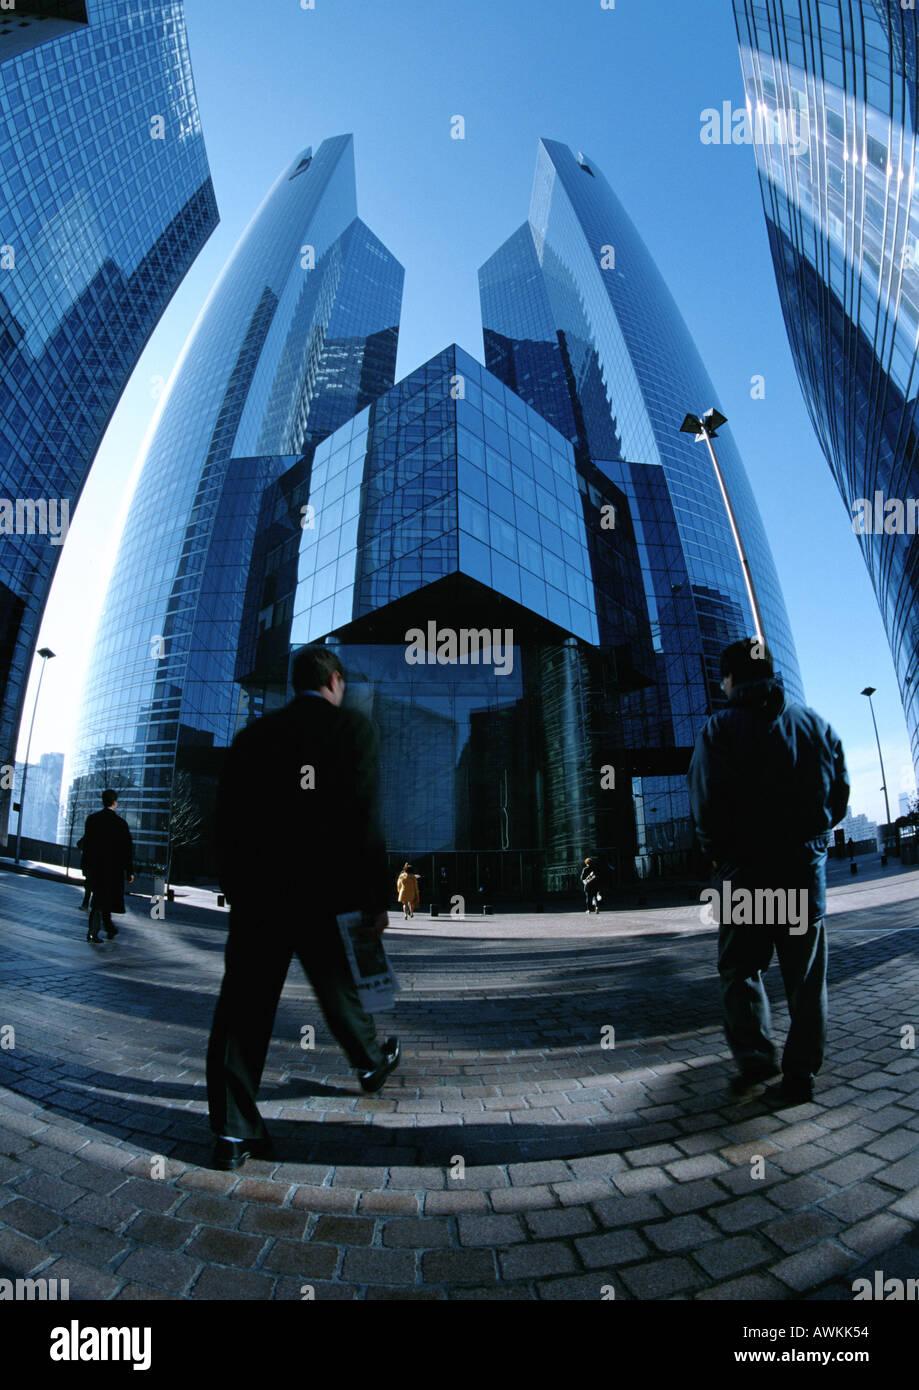 People walking toward skyscrapers - Stock Image